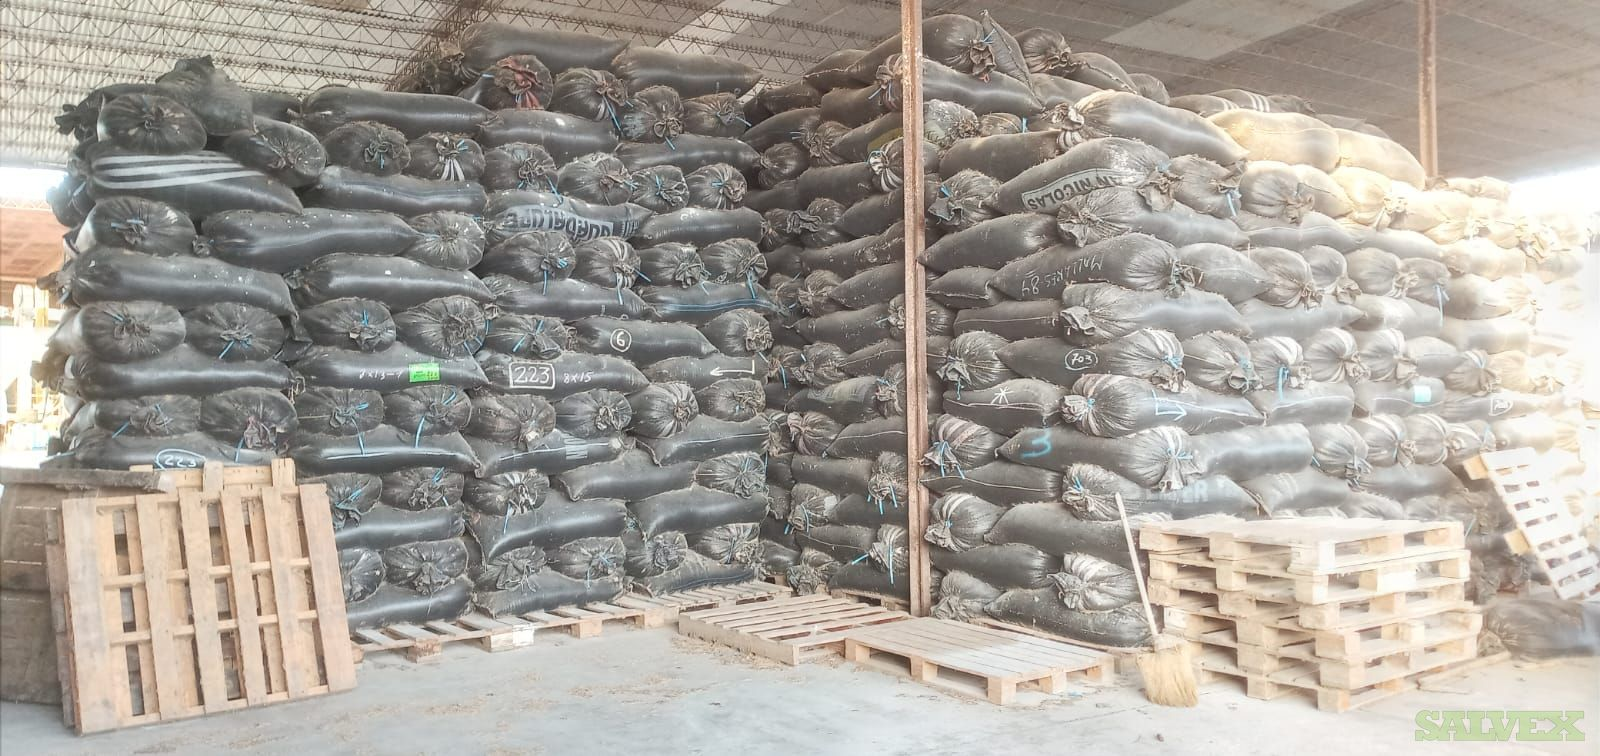 Rice (Arroz Cascara) - 7,726 X 70Kg Bags